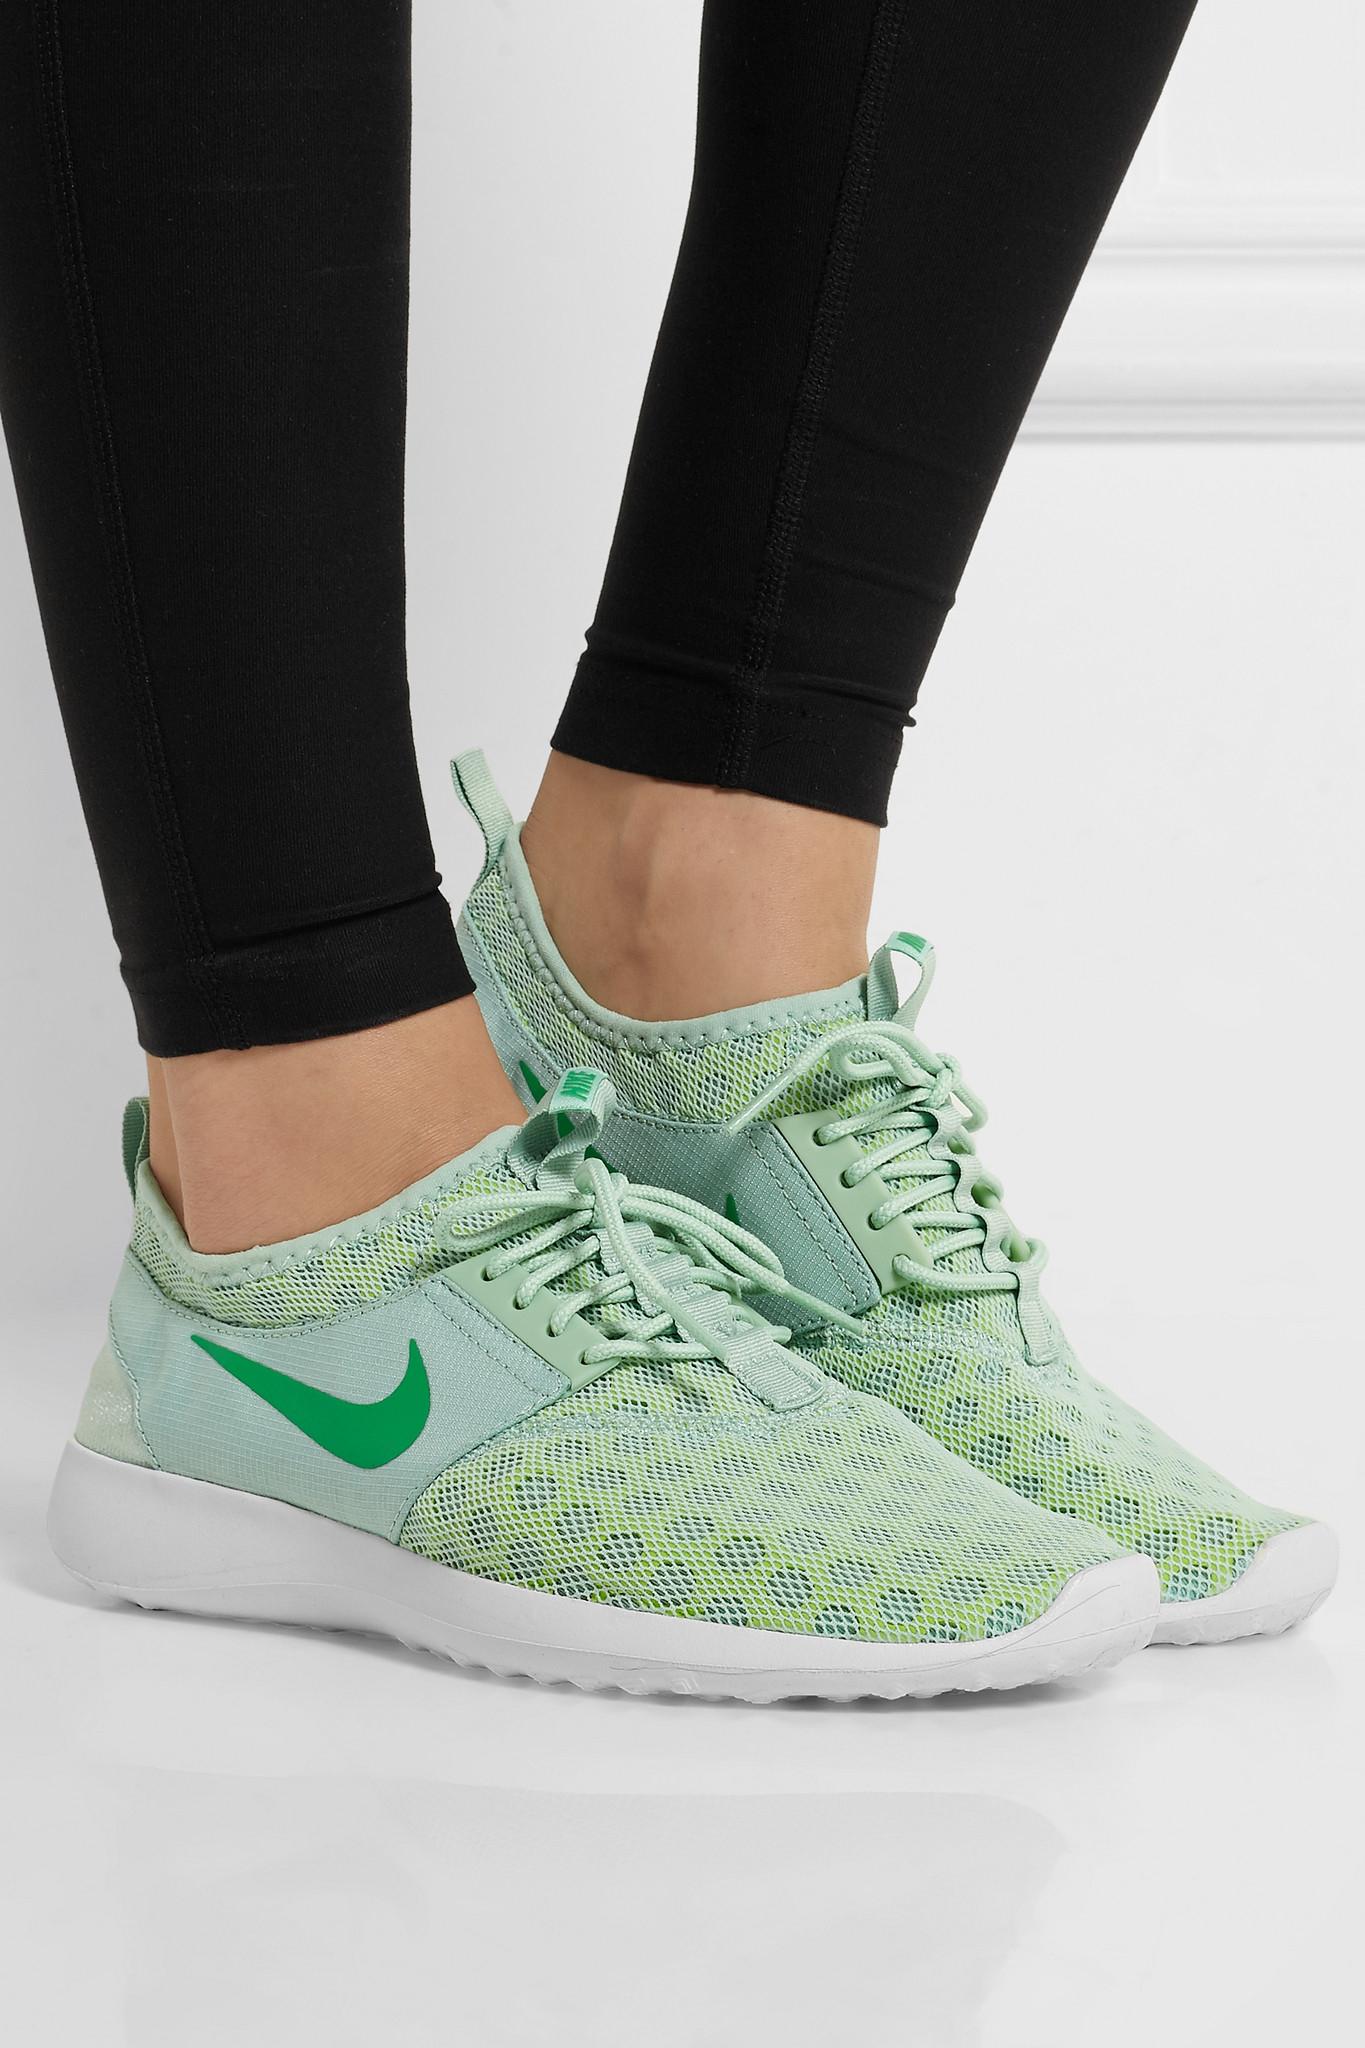 new concept cfbaf f7c1a Nike Juvenate Mesh Sneakers in Green - Lyst